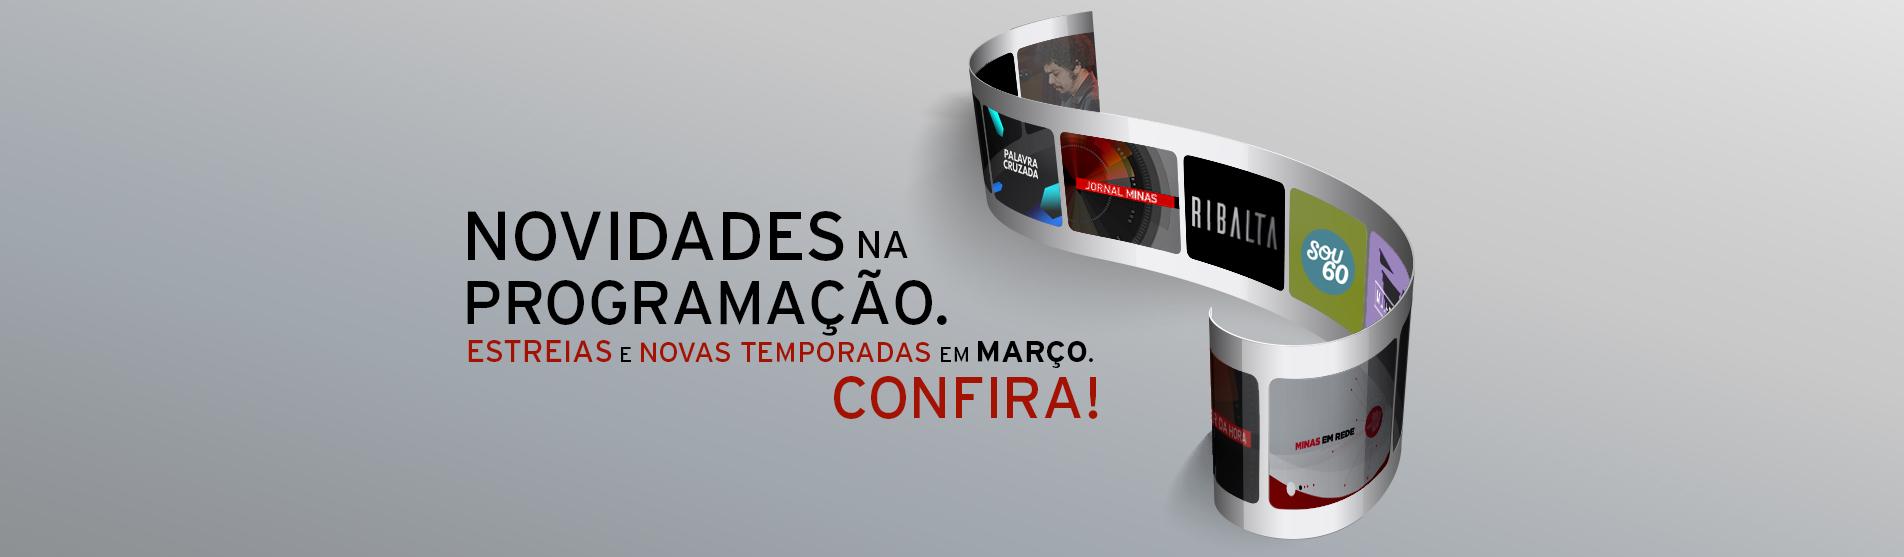 bannerEstreiasMarco1